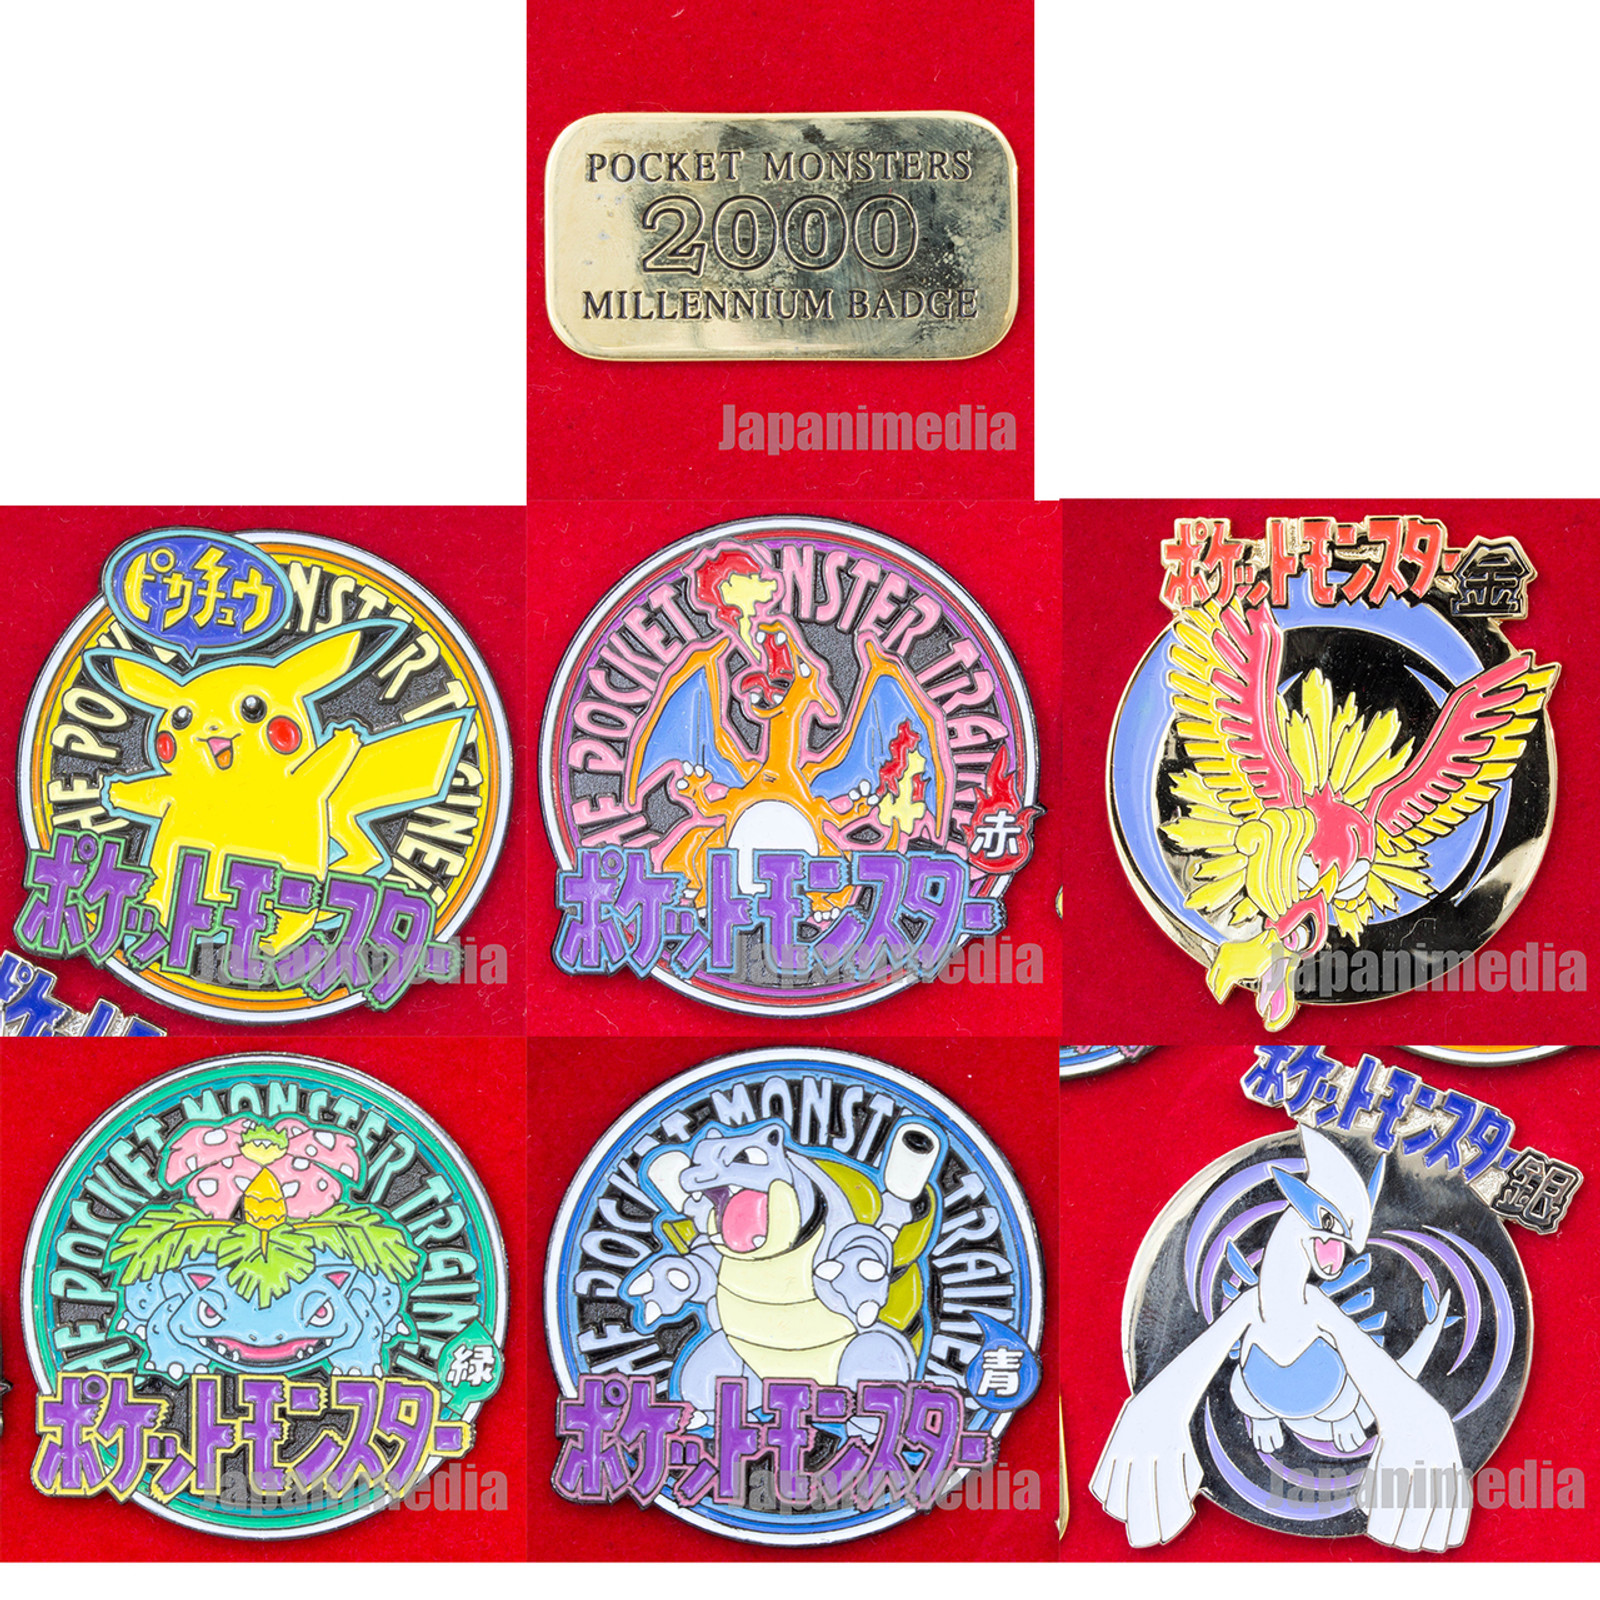 Pokemon Metal Pins 6pc Set 2000 Millennium Badge Pocket Monsters Pikachu JAPAN